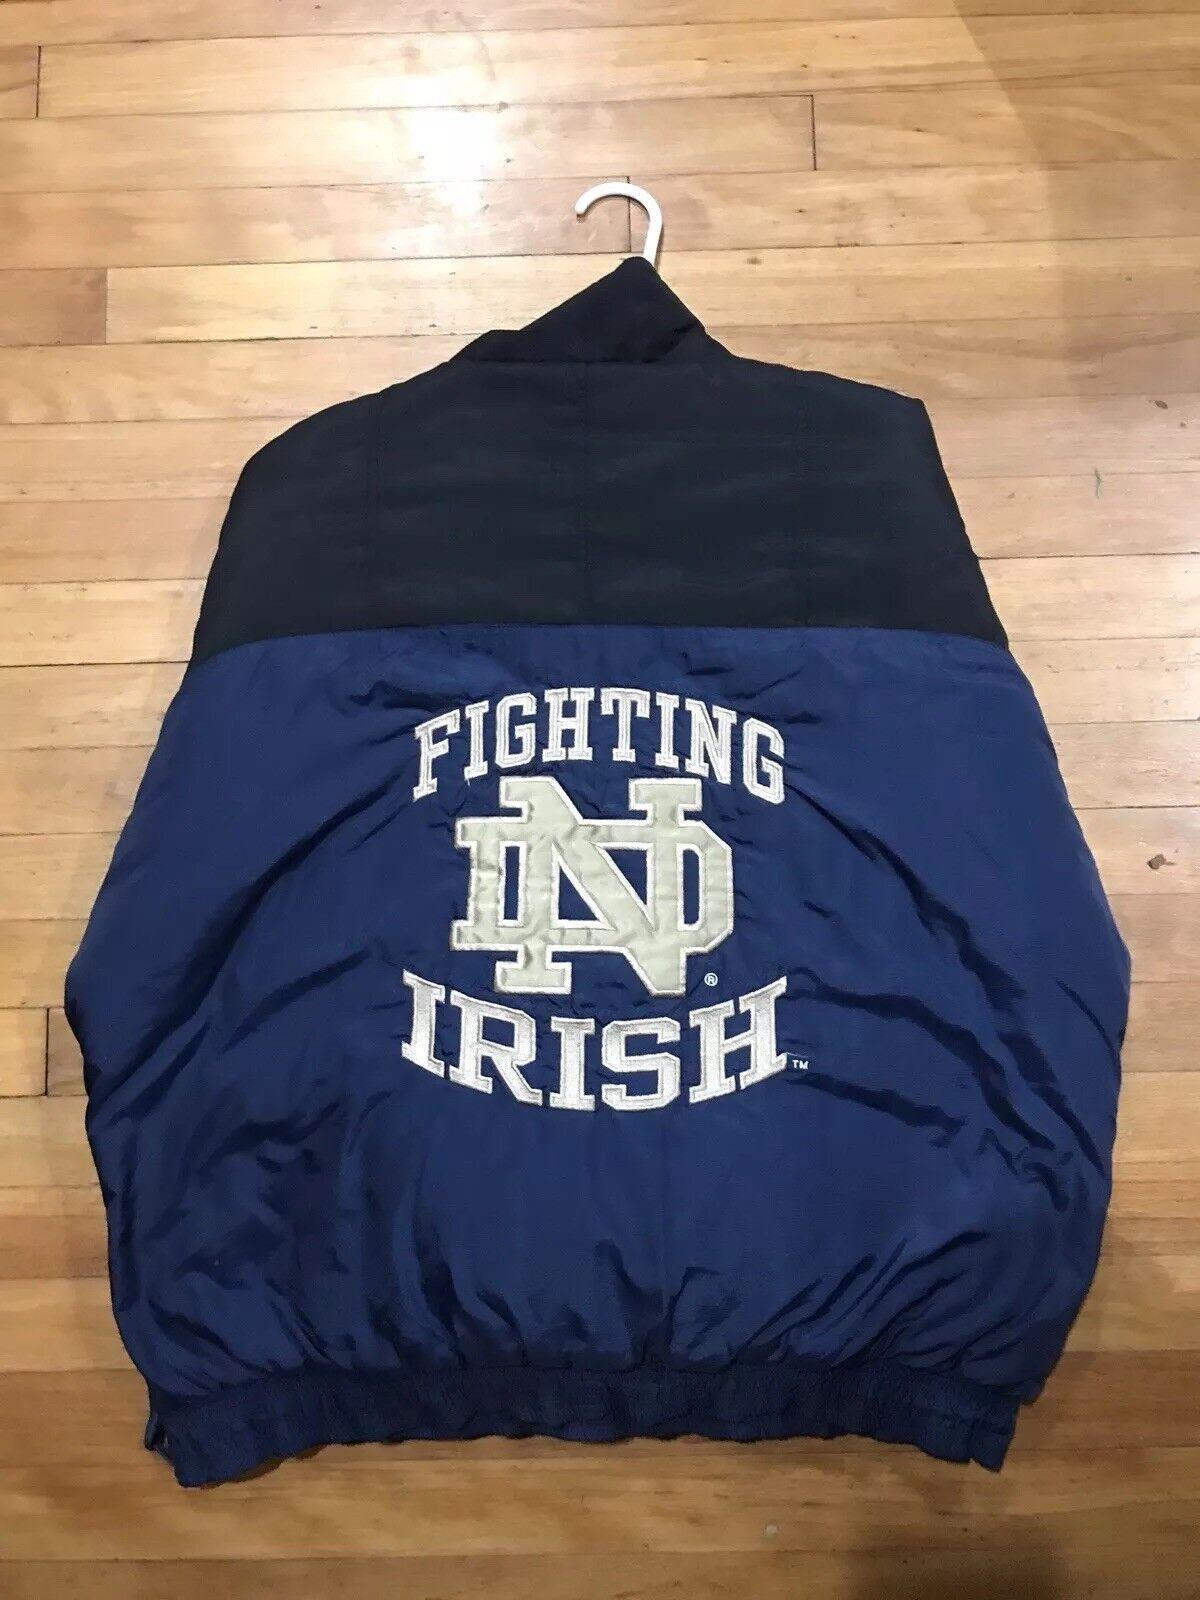 Vintage Starter - NOTRE DAME FIGHTING IRISH 1 4 ZIP COAT 90s bluee gold - L Large